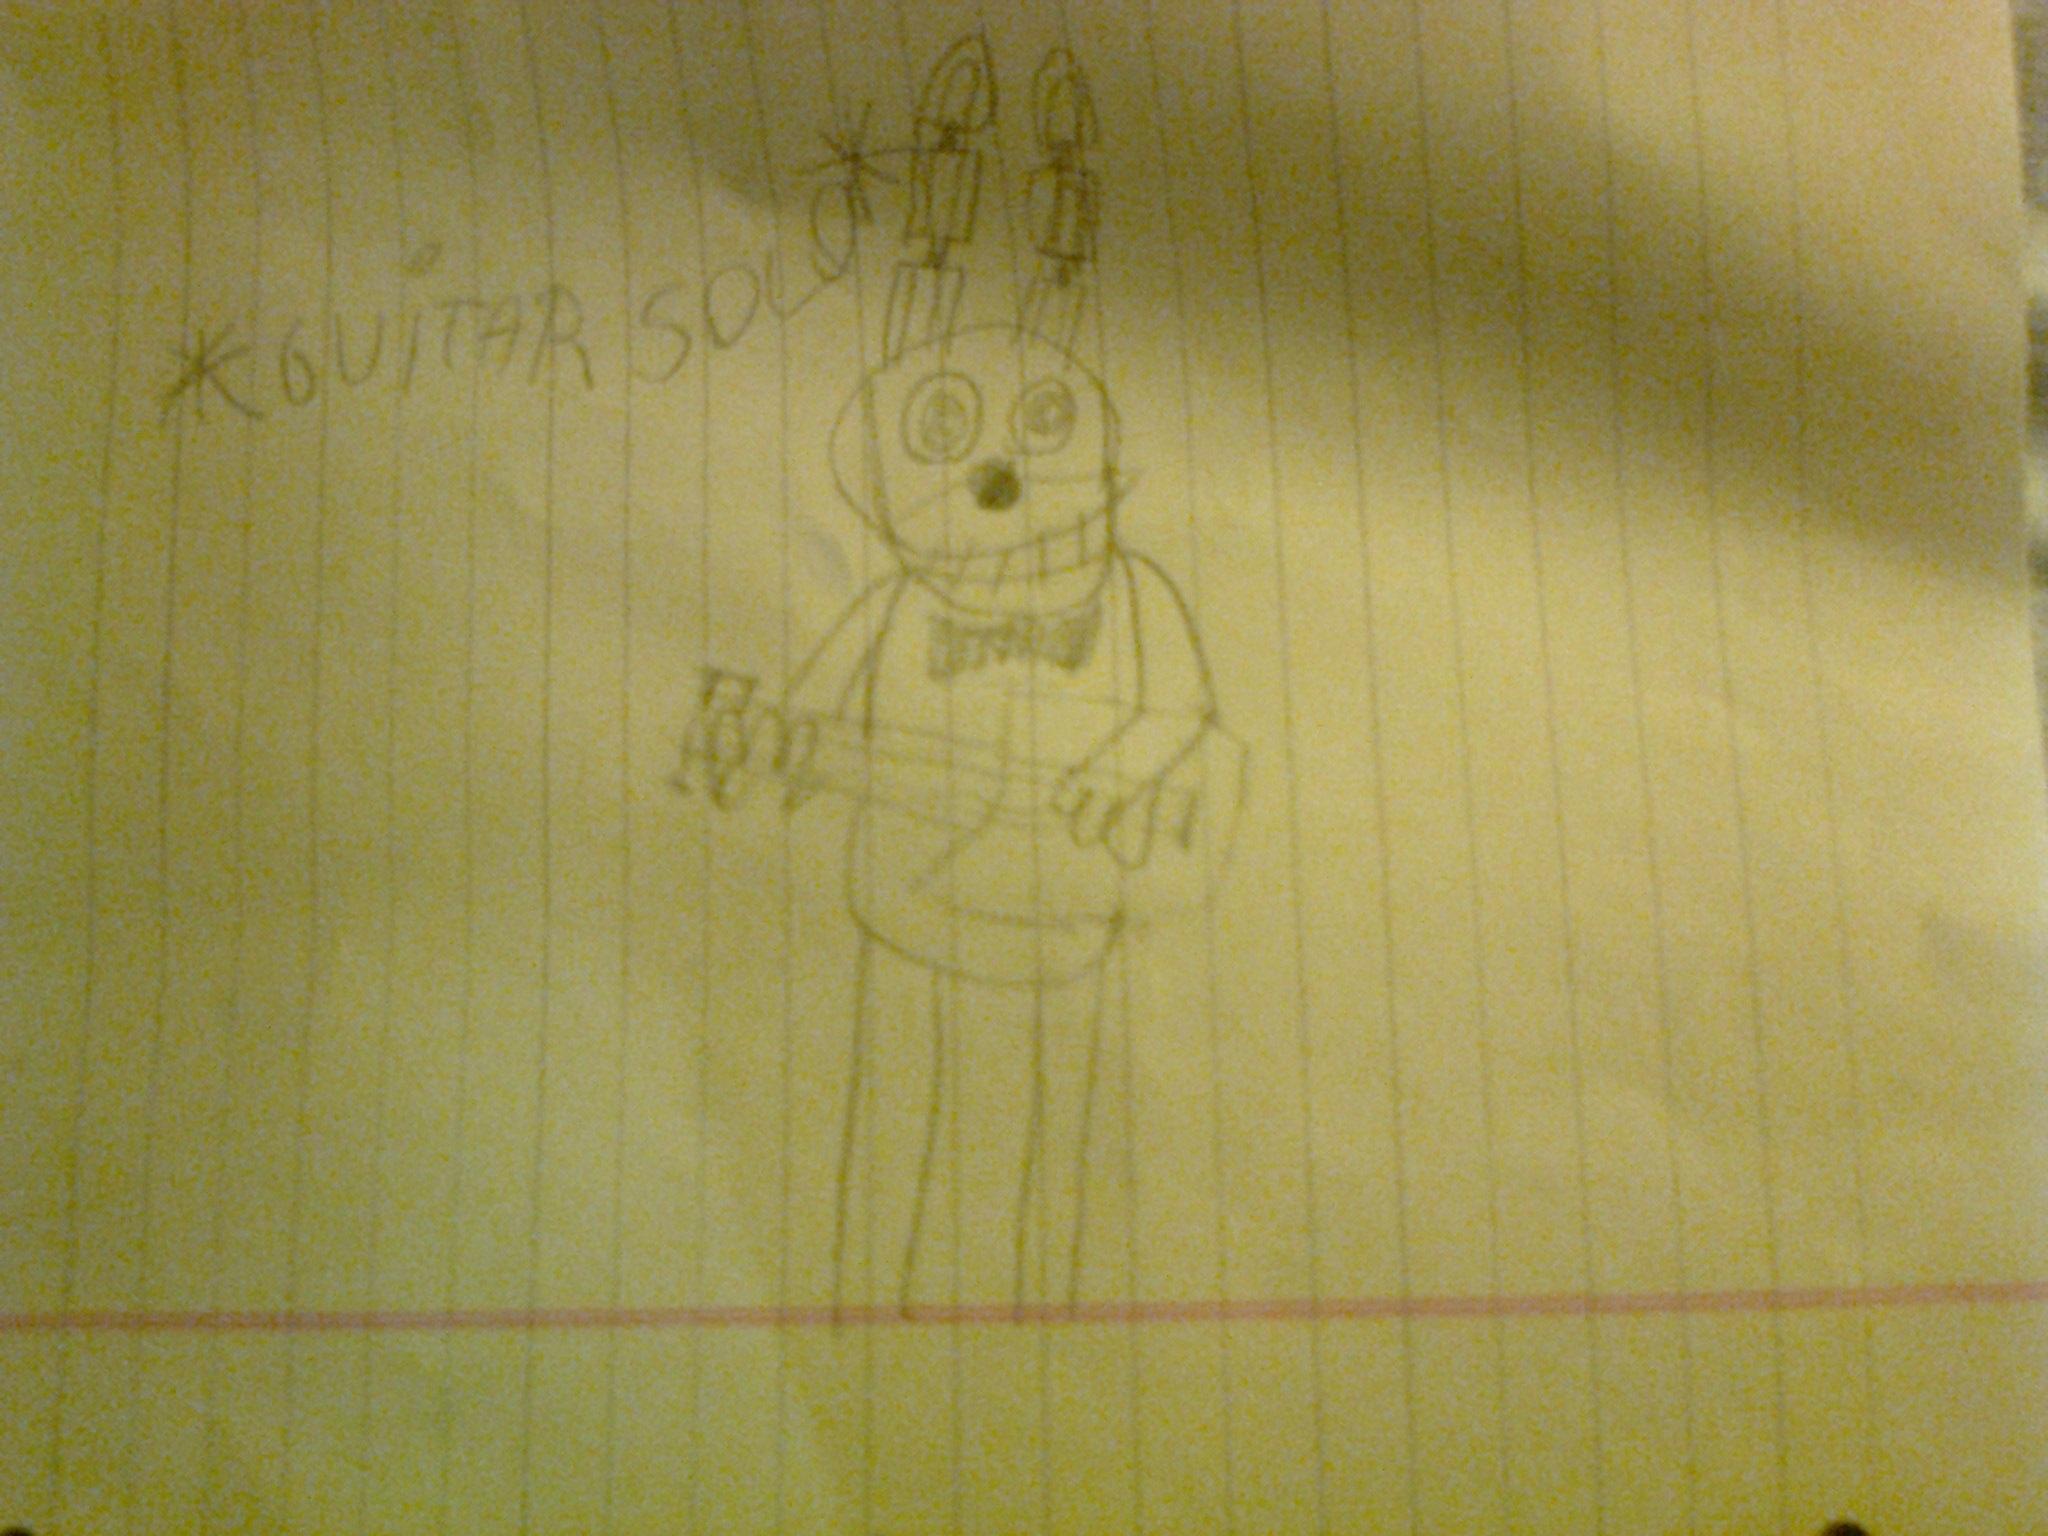 my horrible fnaf art 2